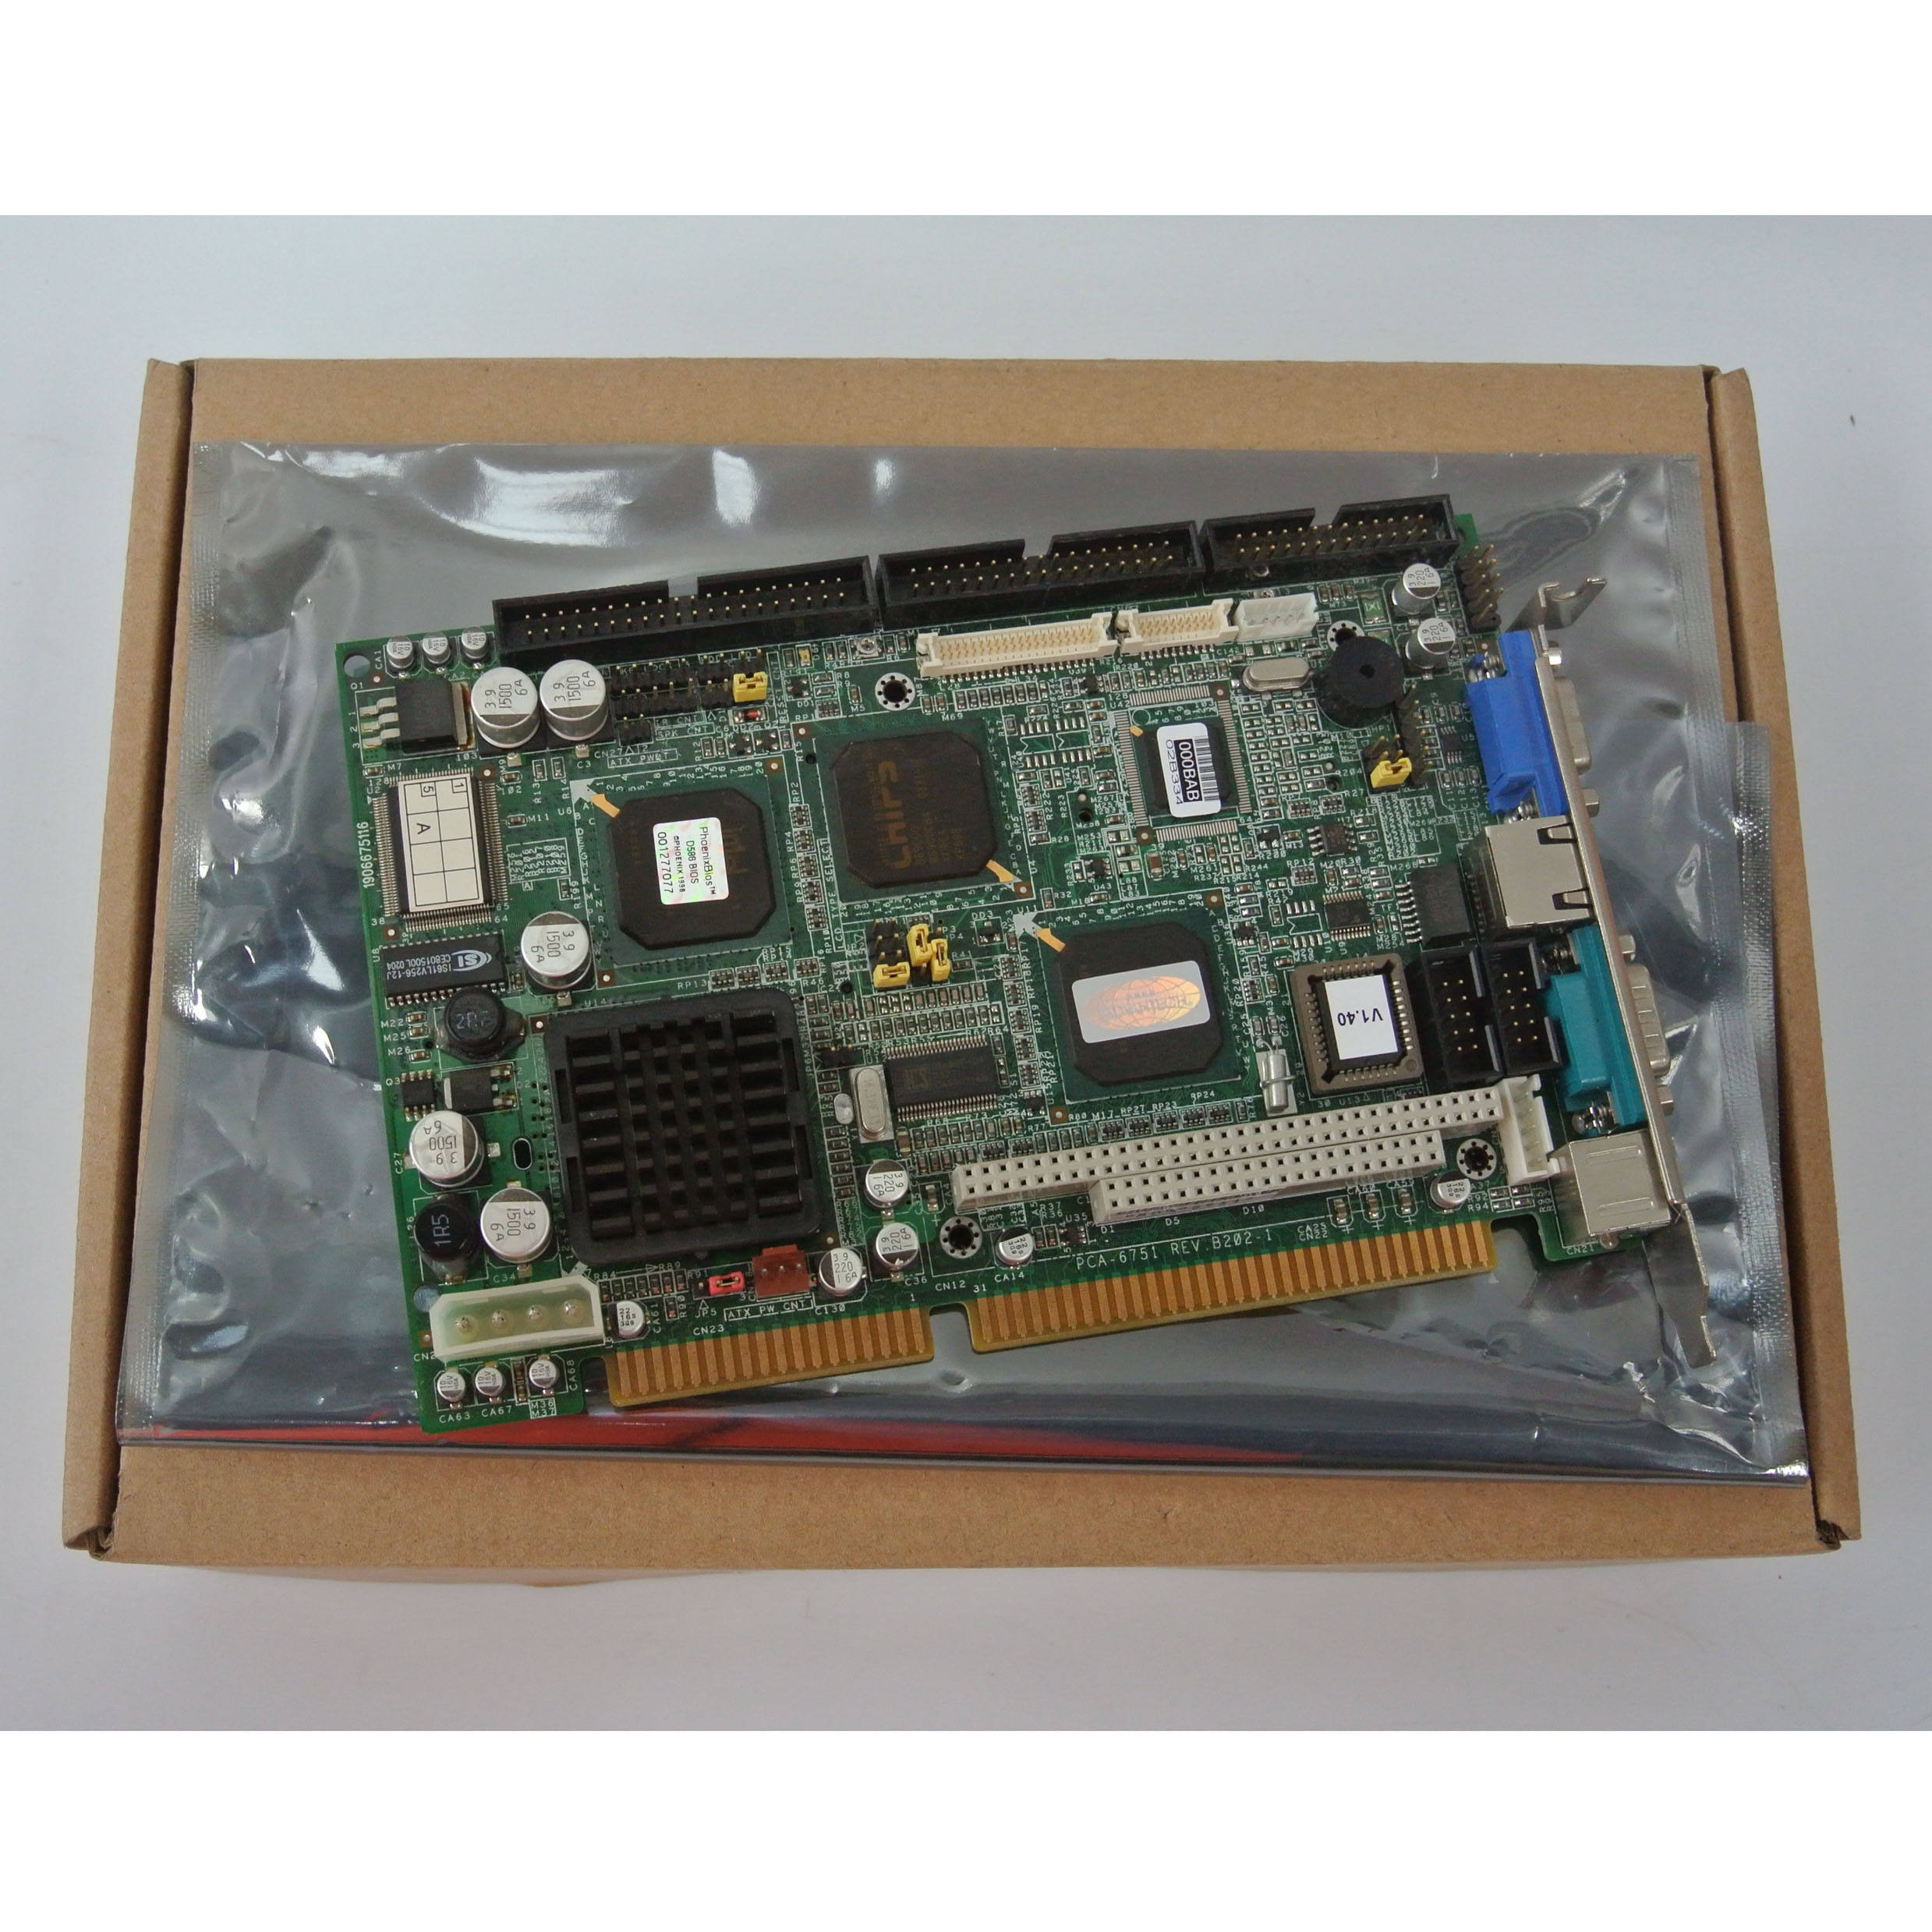 Flash Memory memory Advantech PCA-6751 Rev B1  Industrial Motherboard